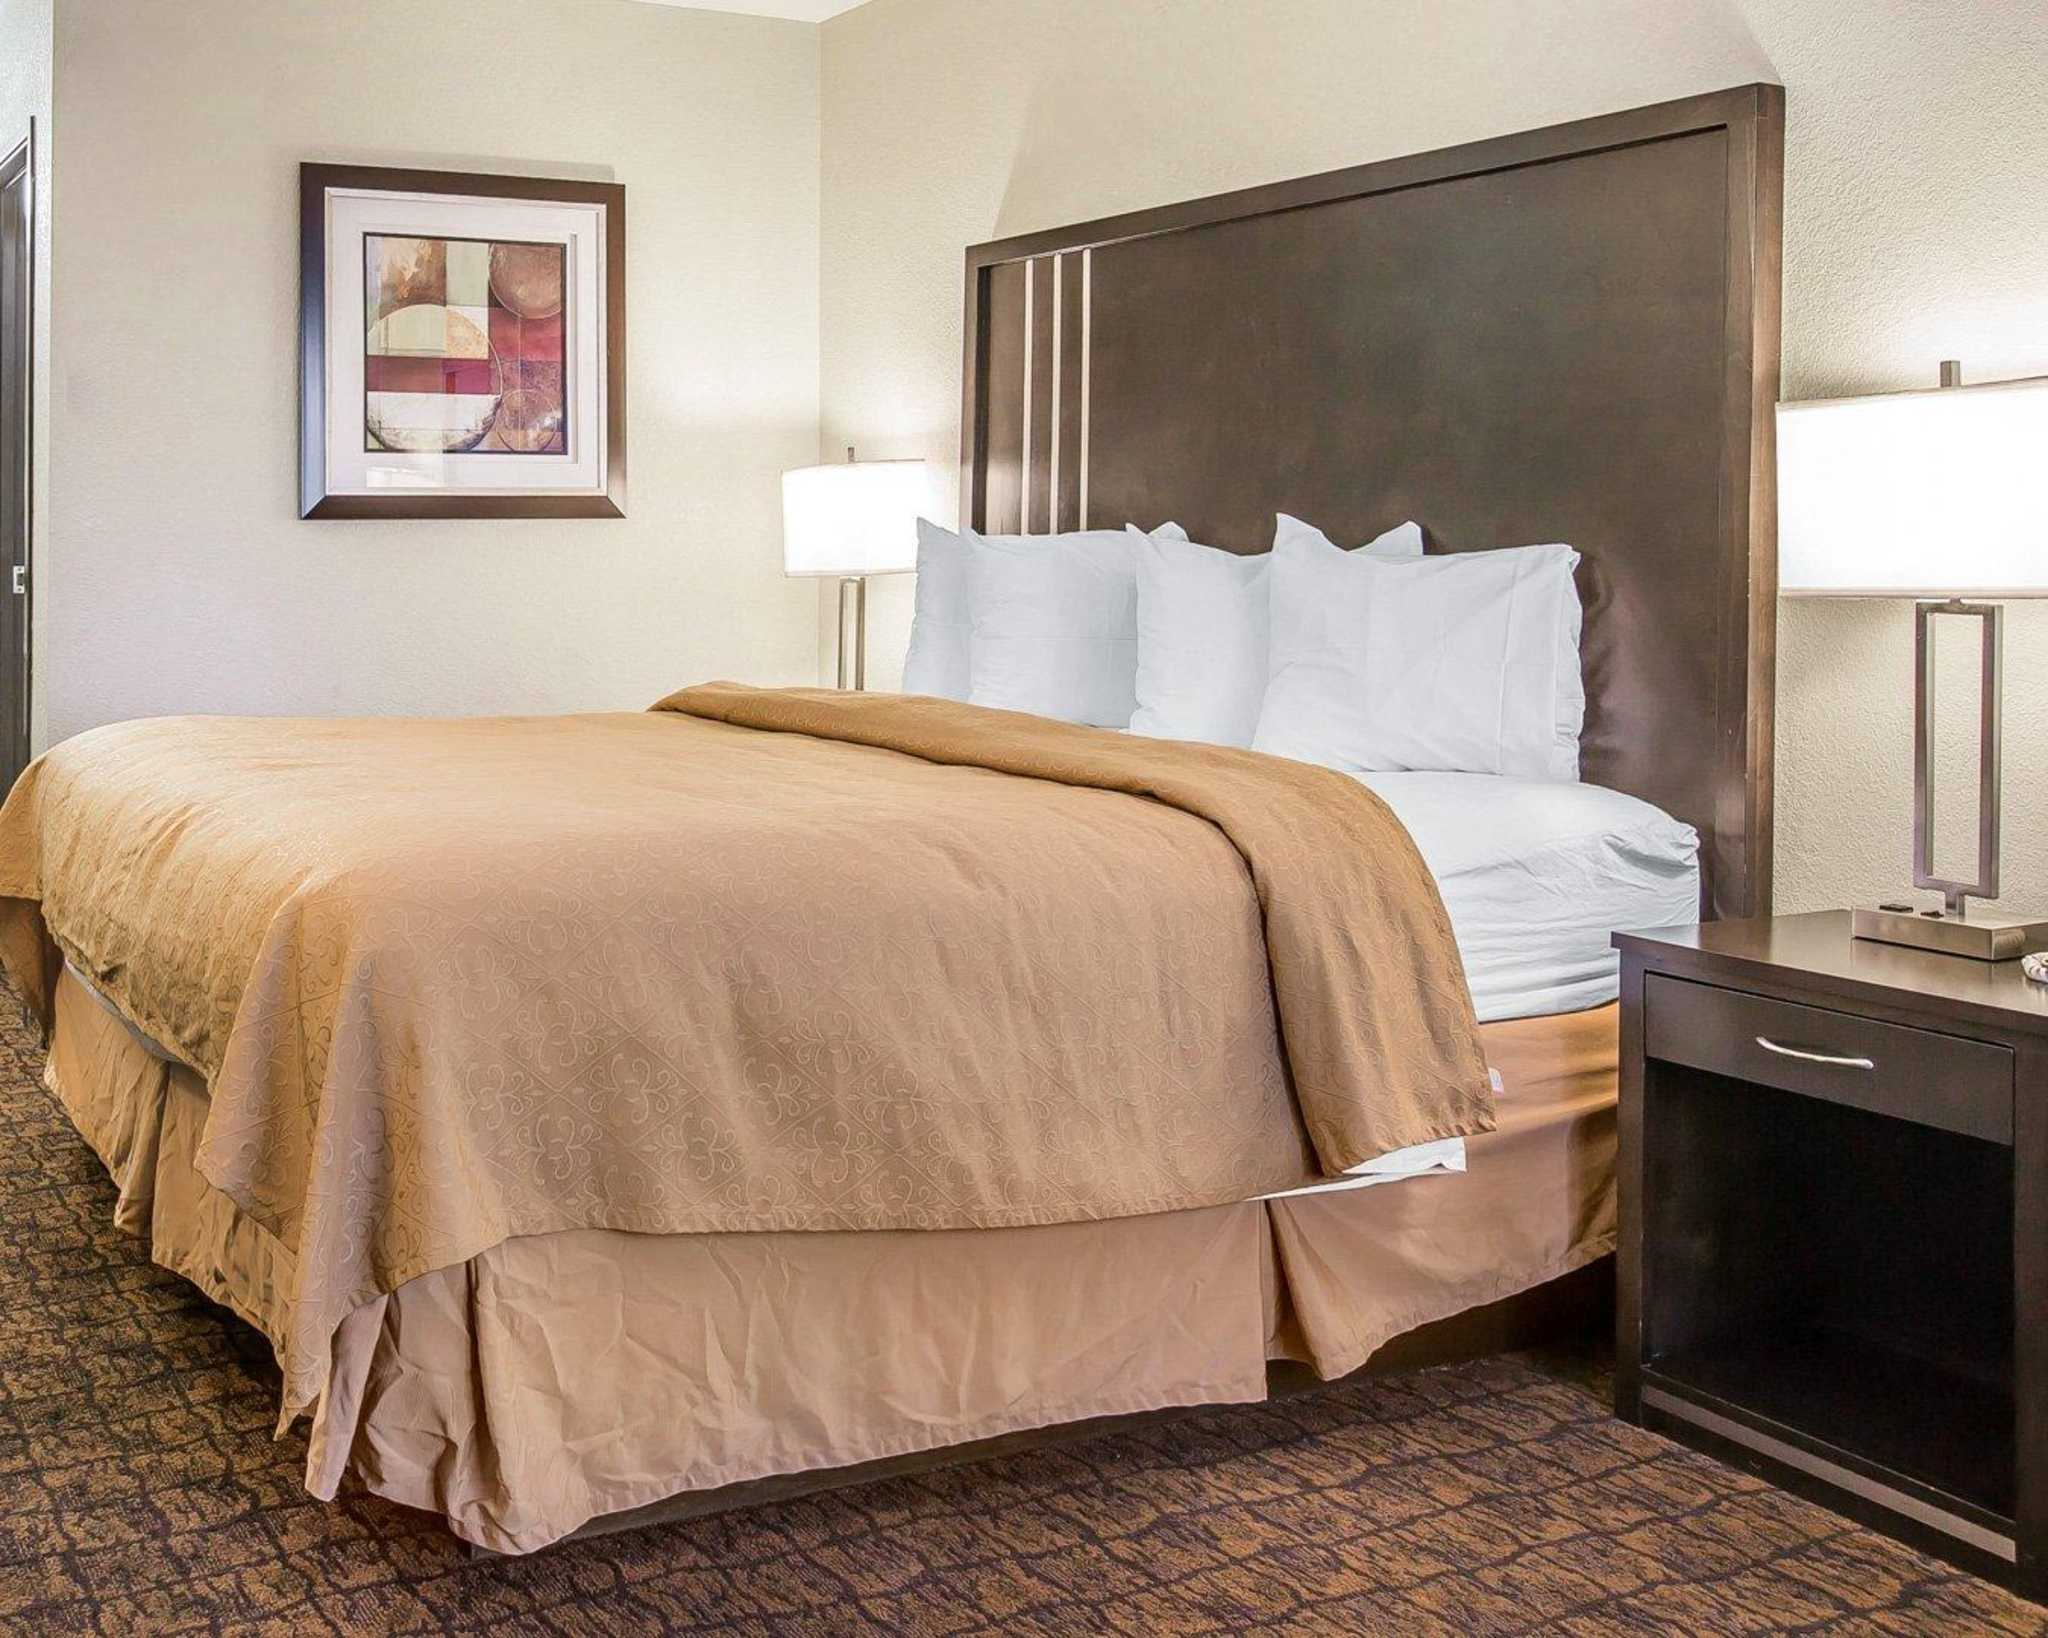 Quality Inn & Suites Woodland - Sacramento Airport image 9